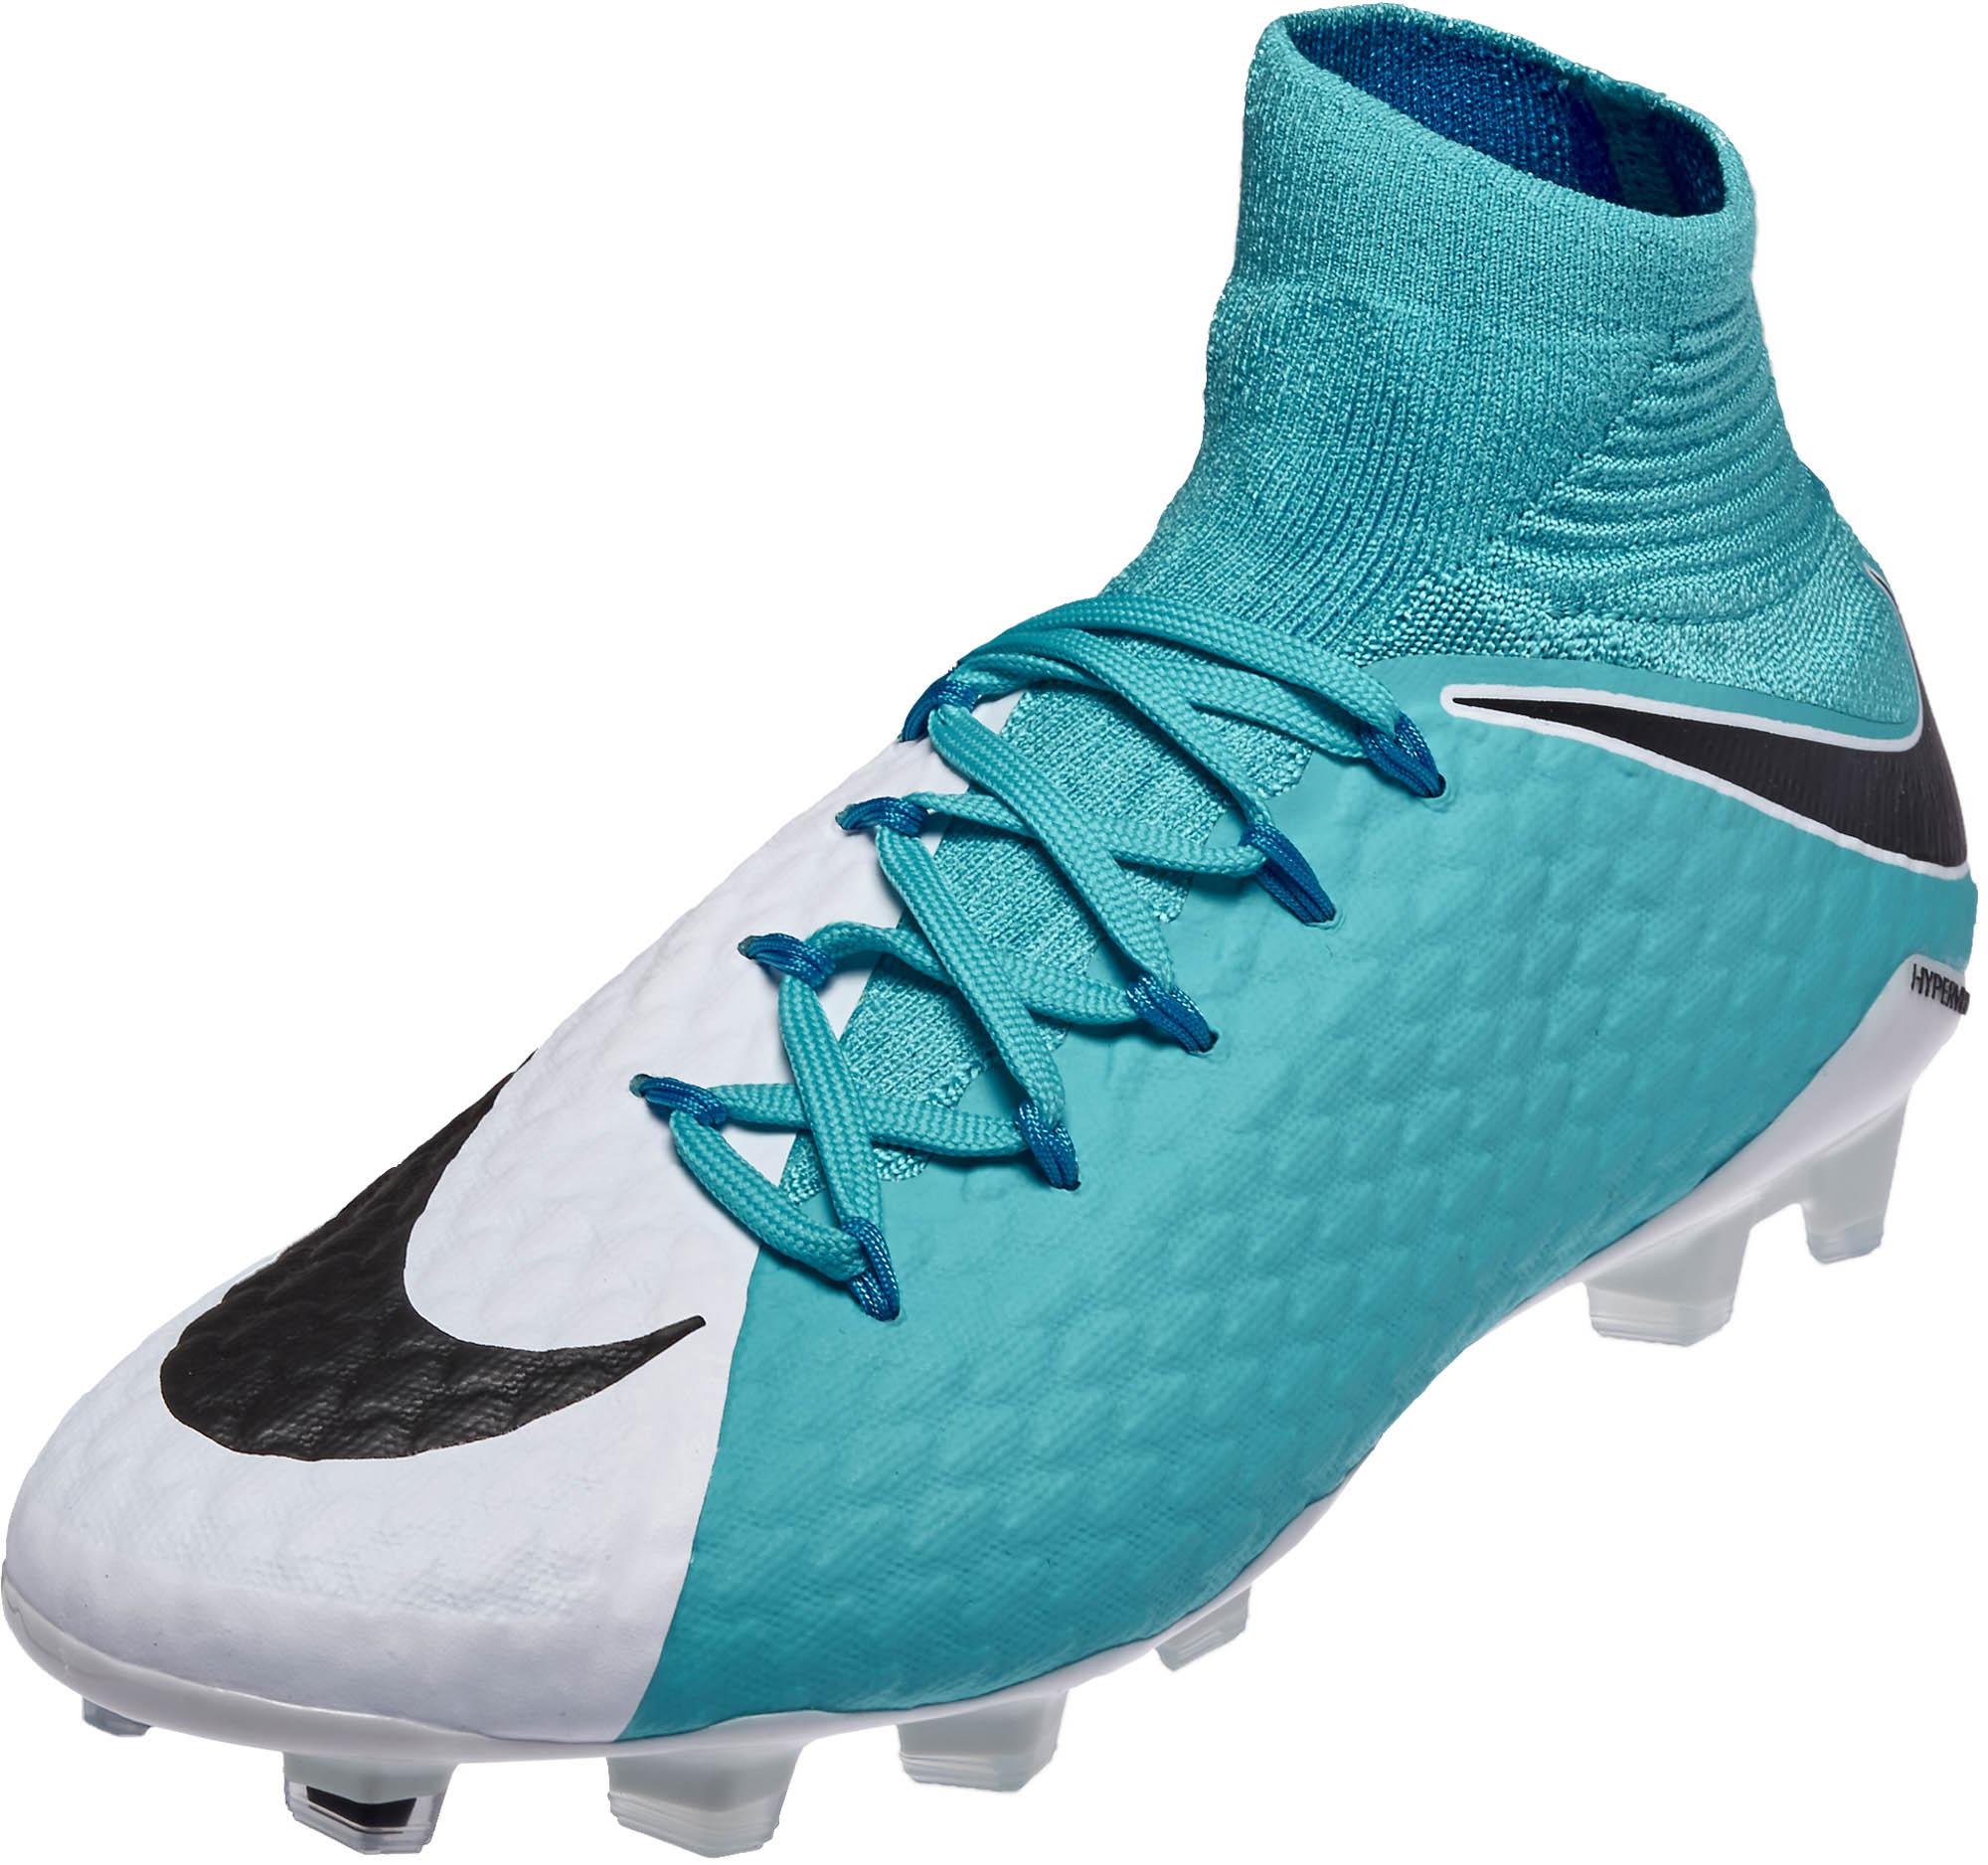 Nike Hypervenom Phatal III DF FG - Nike Soccer Cleats